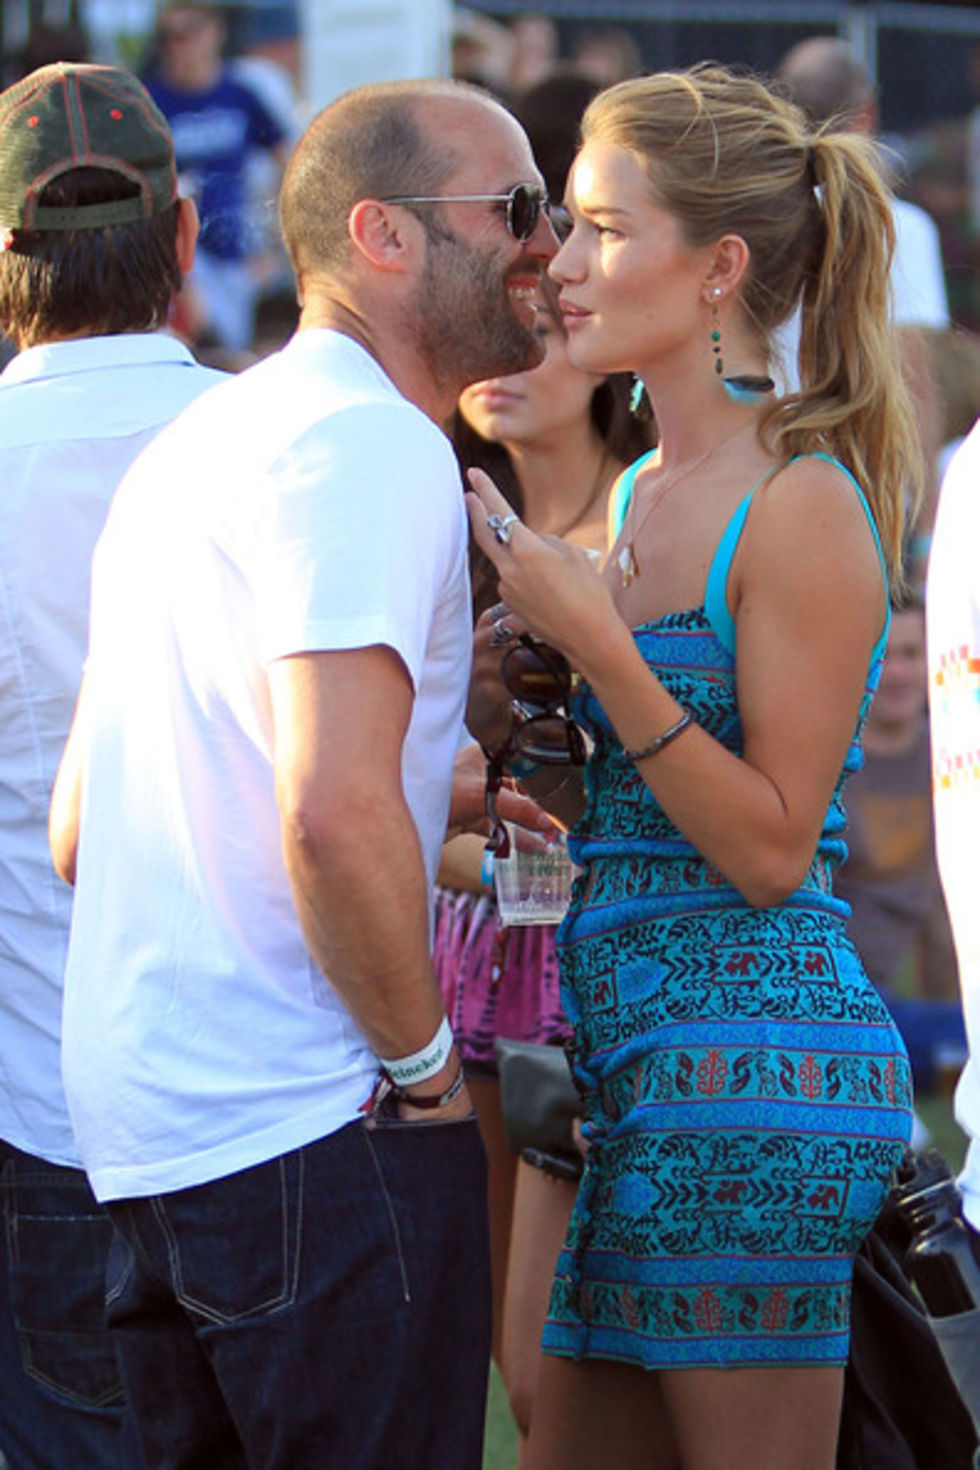 Rosie Huntington Whiteley With Jason Statham At Coachella Day 3 19 Gotceleb